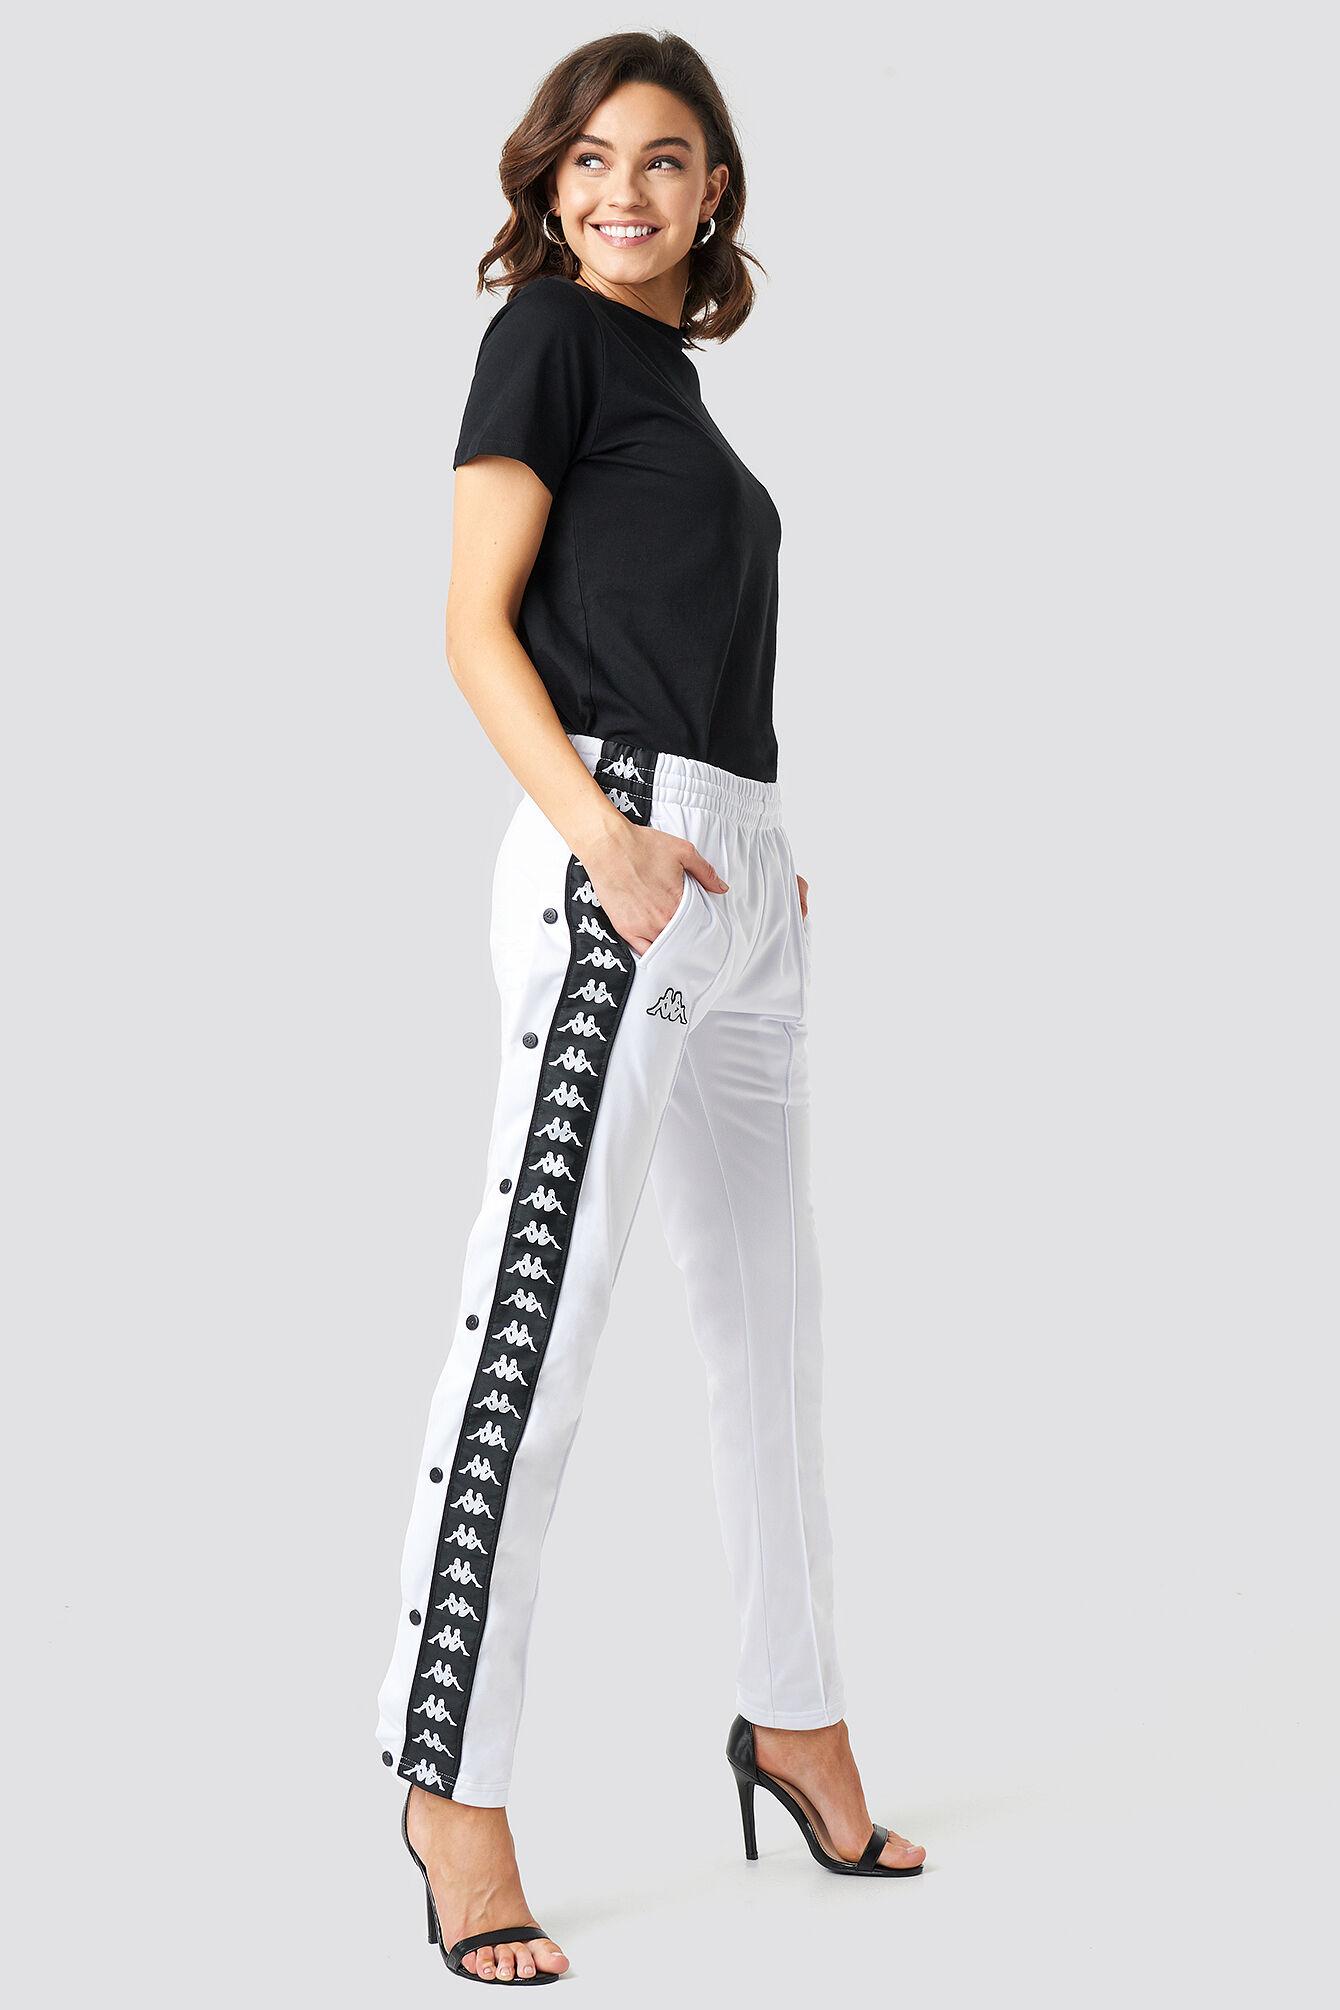 Kappa Astoria Slim Pants - White  - Size: Small